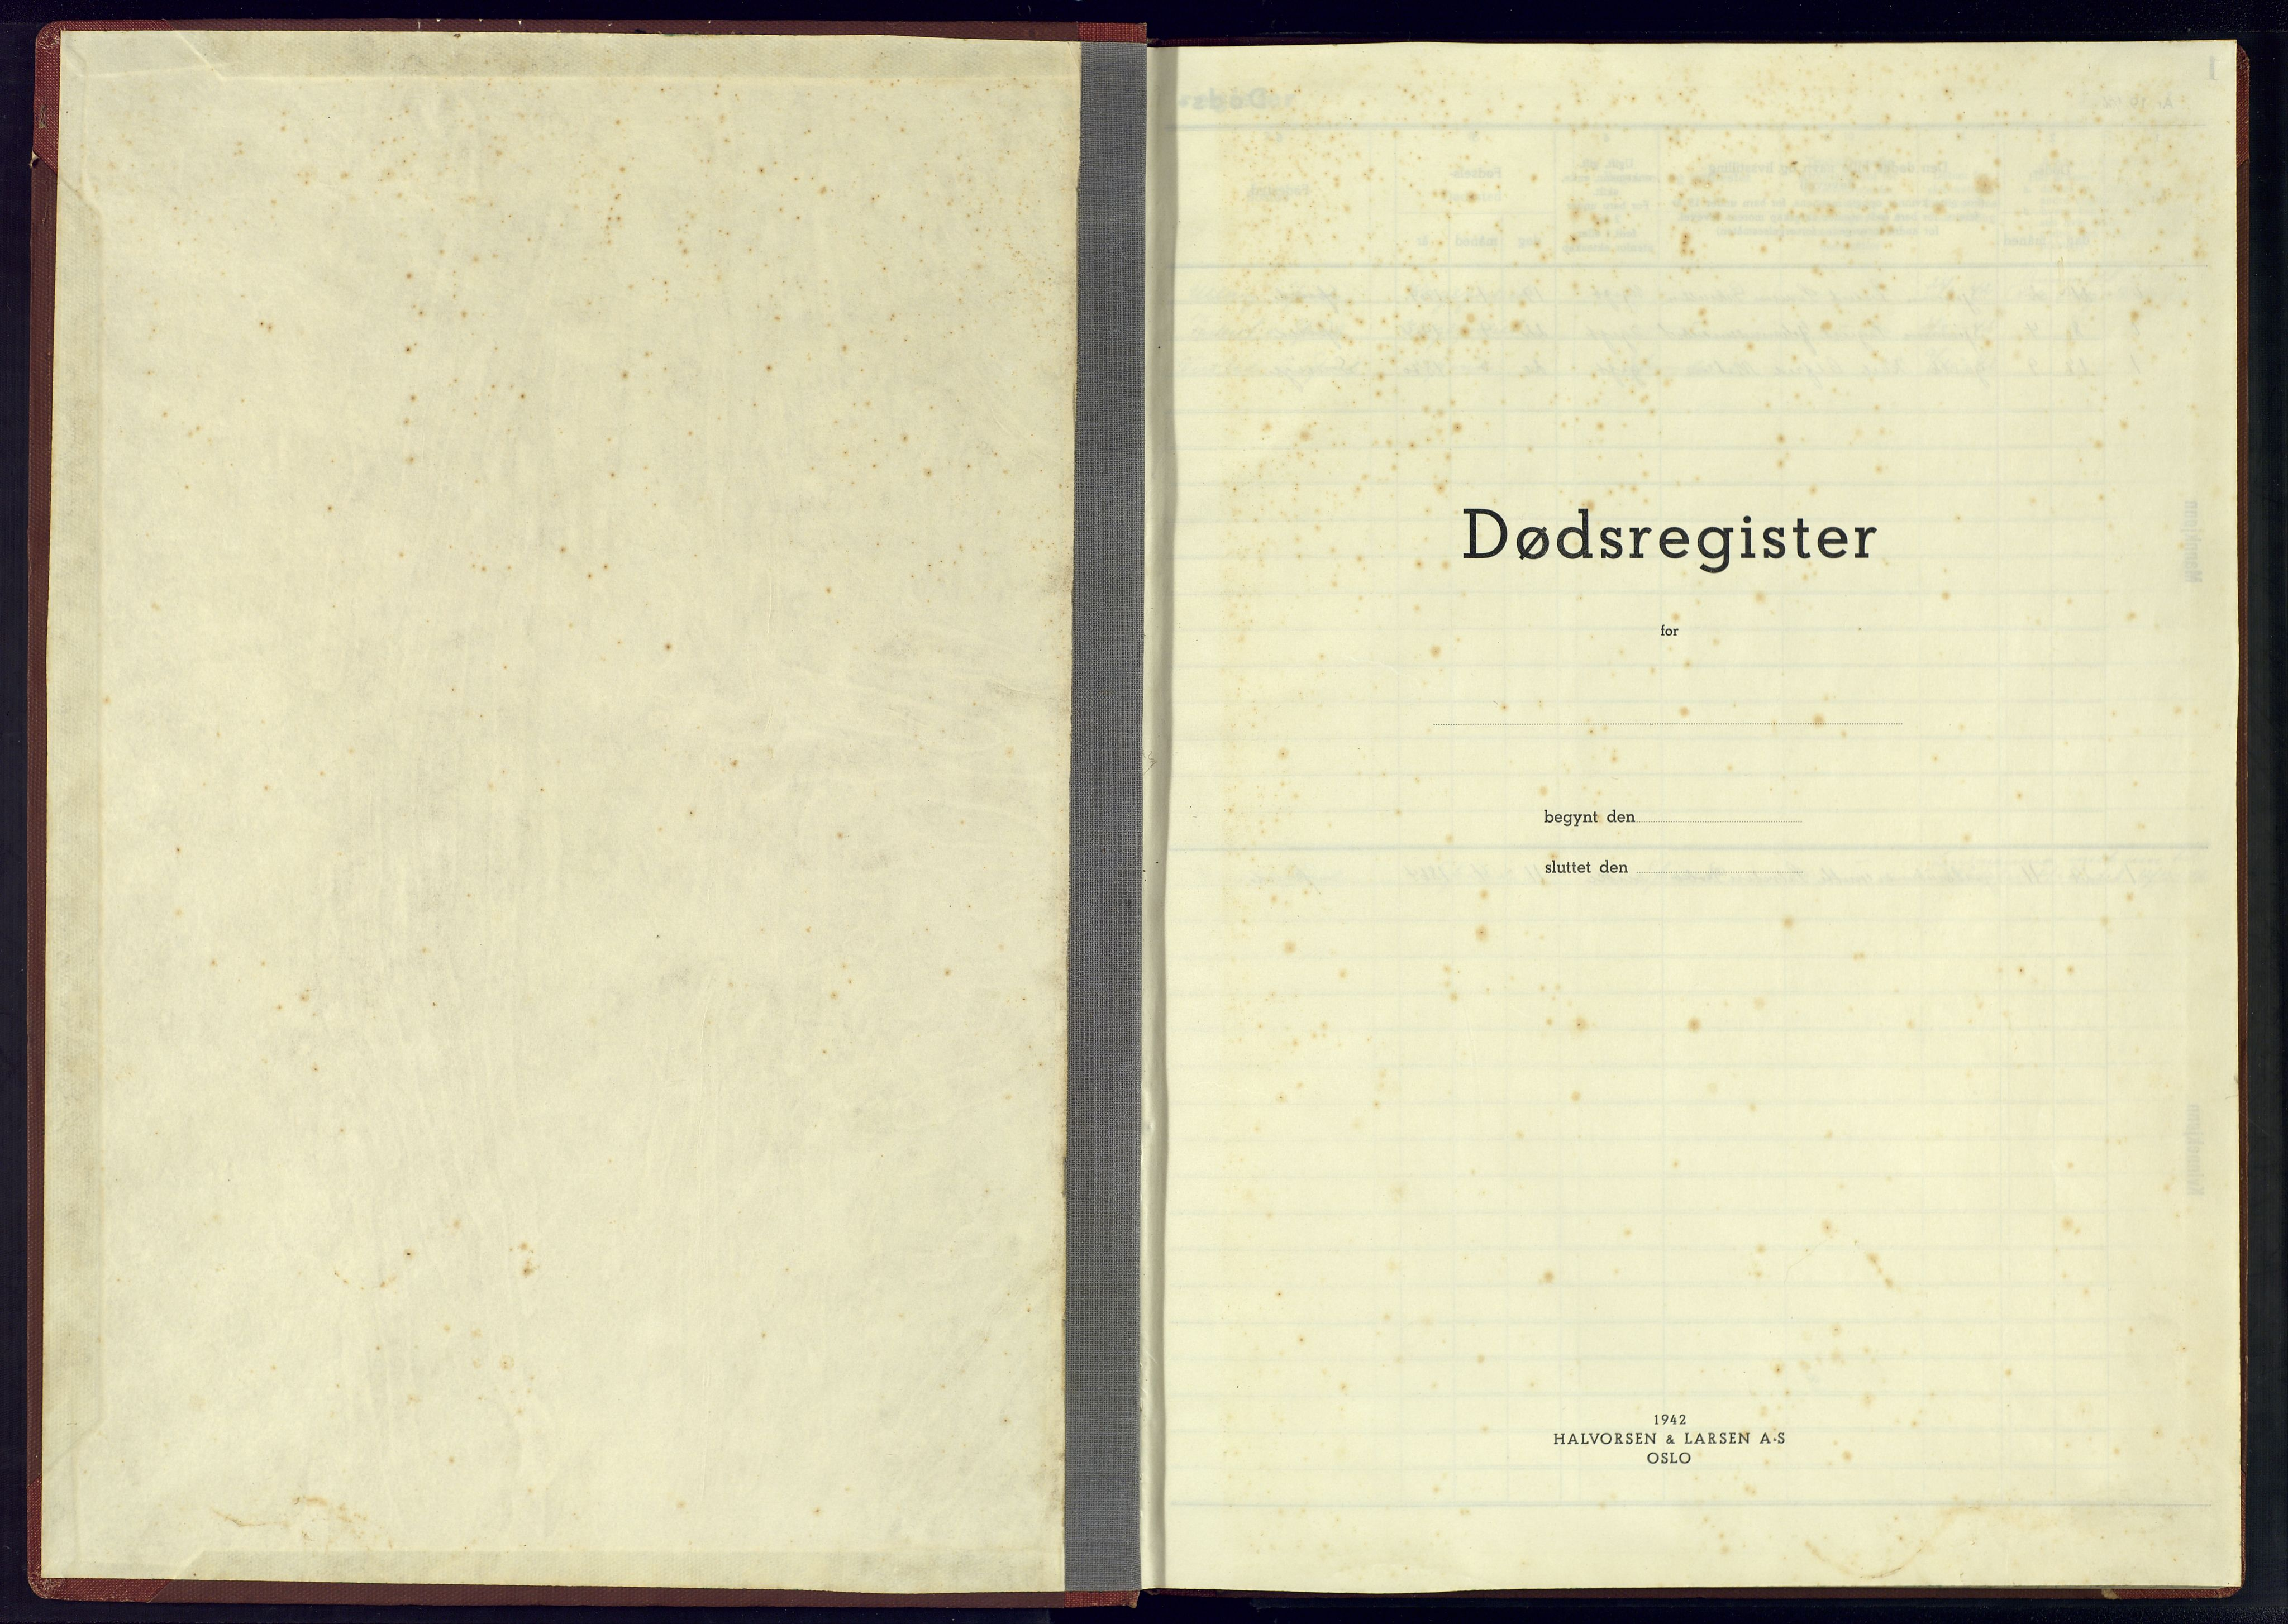 SAK, Herad sokneprestkontor, J/Jb/L0006: A-VI-7 - Dødsfallsregister Spind sogn, 1942-1945